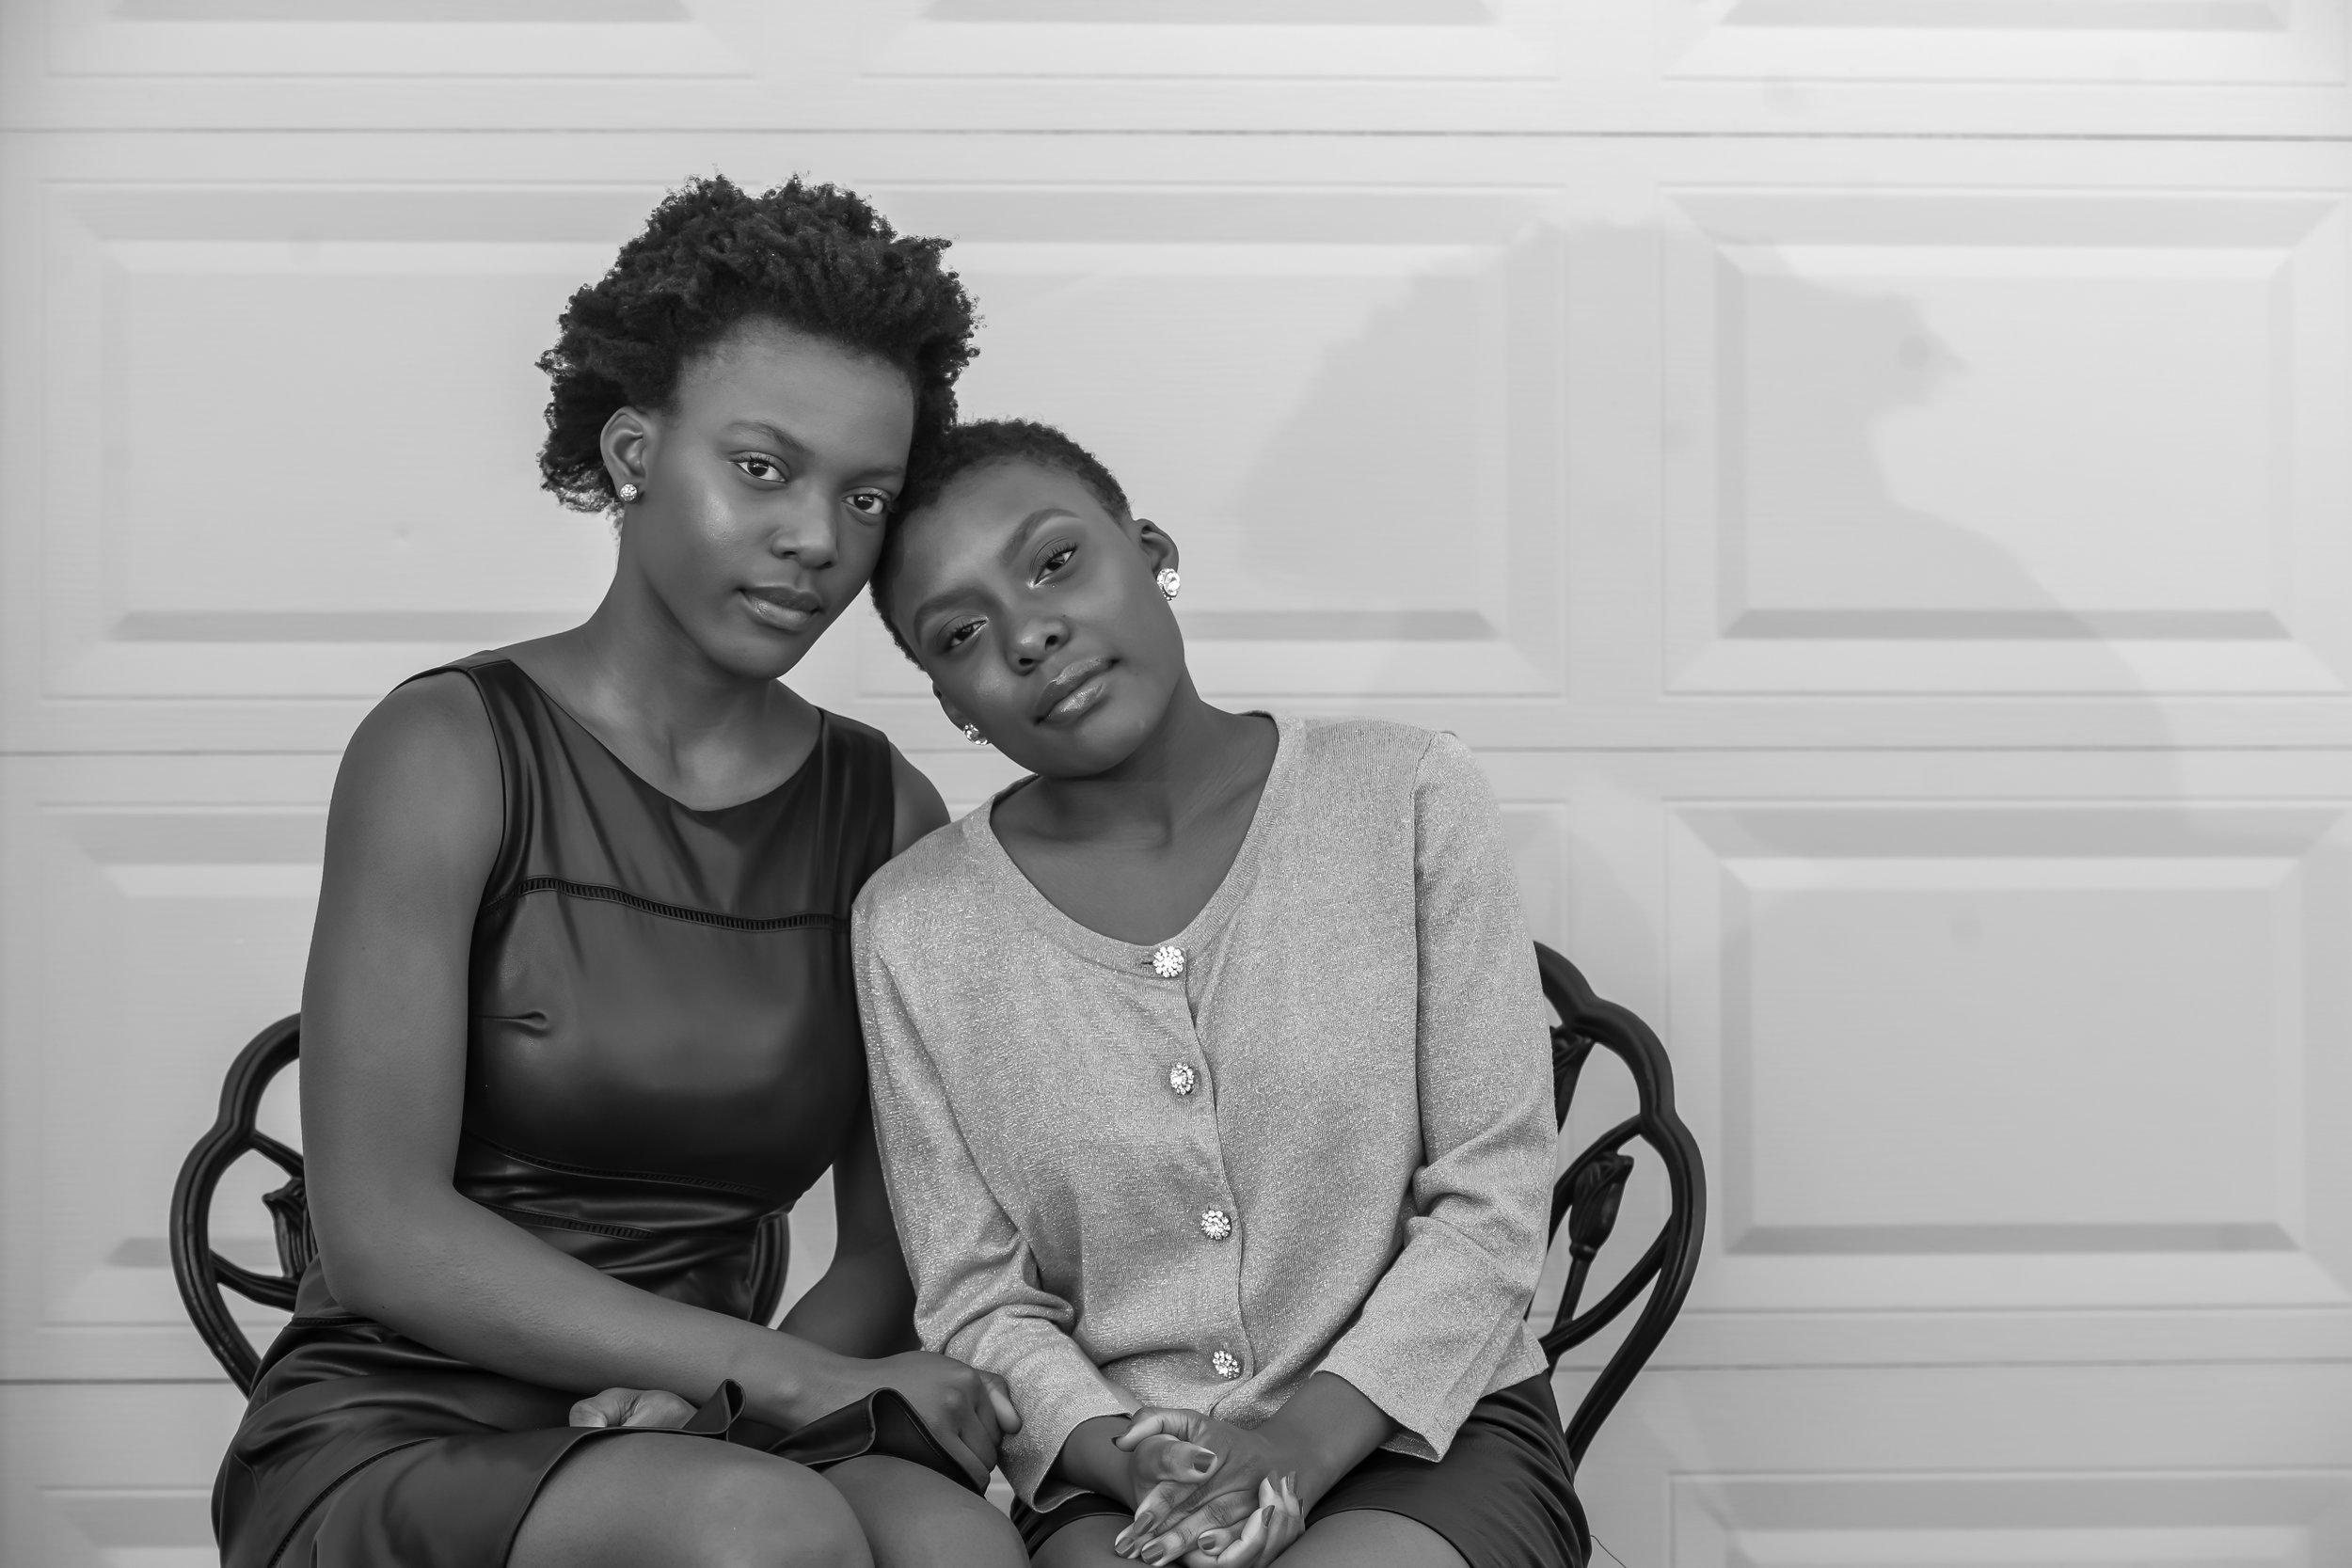 Sisterhood is everything to us. -